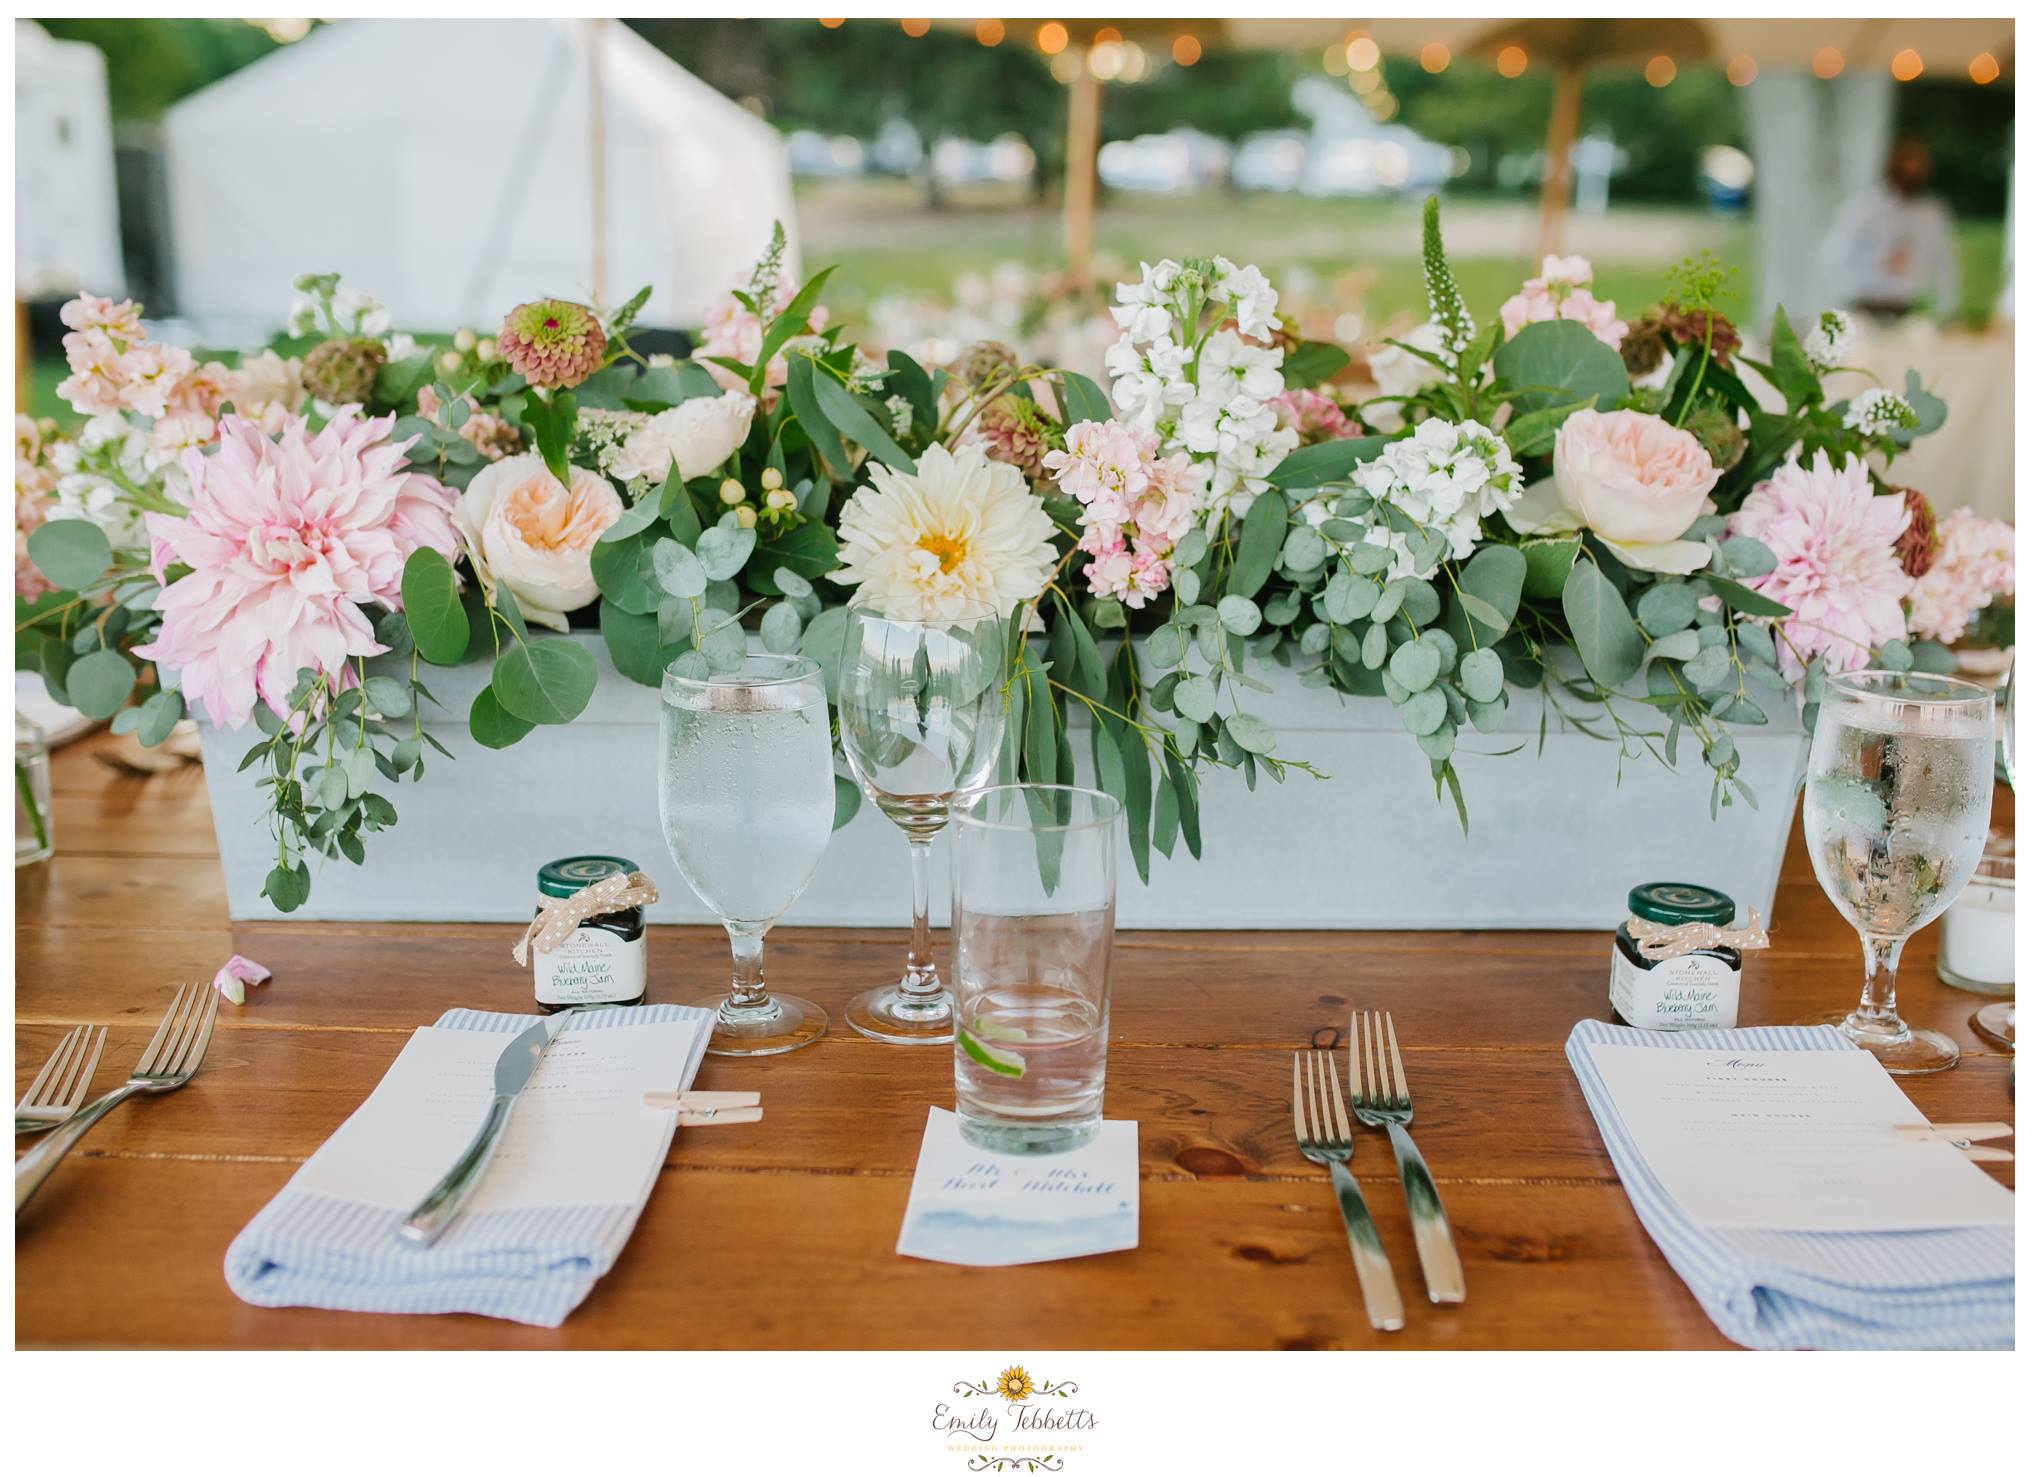 Emily Tebbetts Photography Wedding || Private Residence : Dauntless Club, Essex, CT 5.jpg